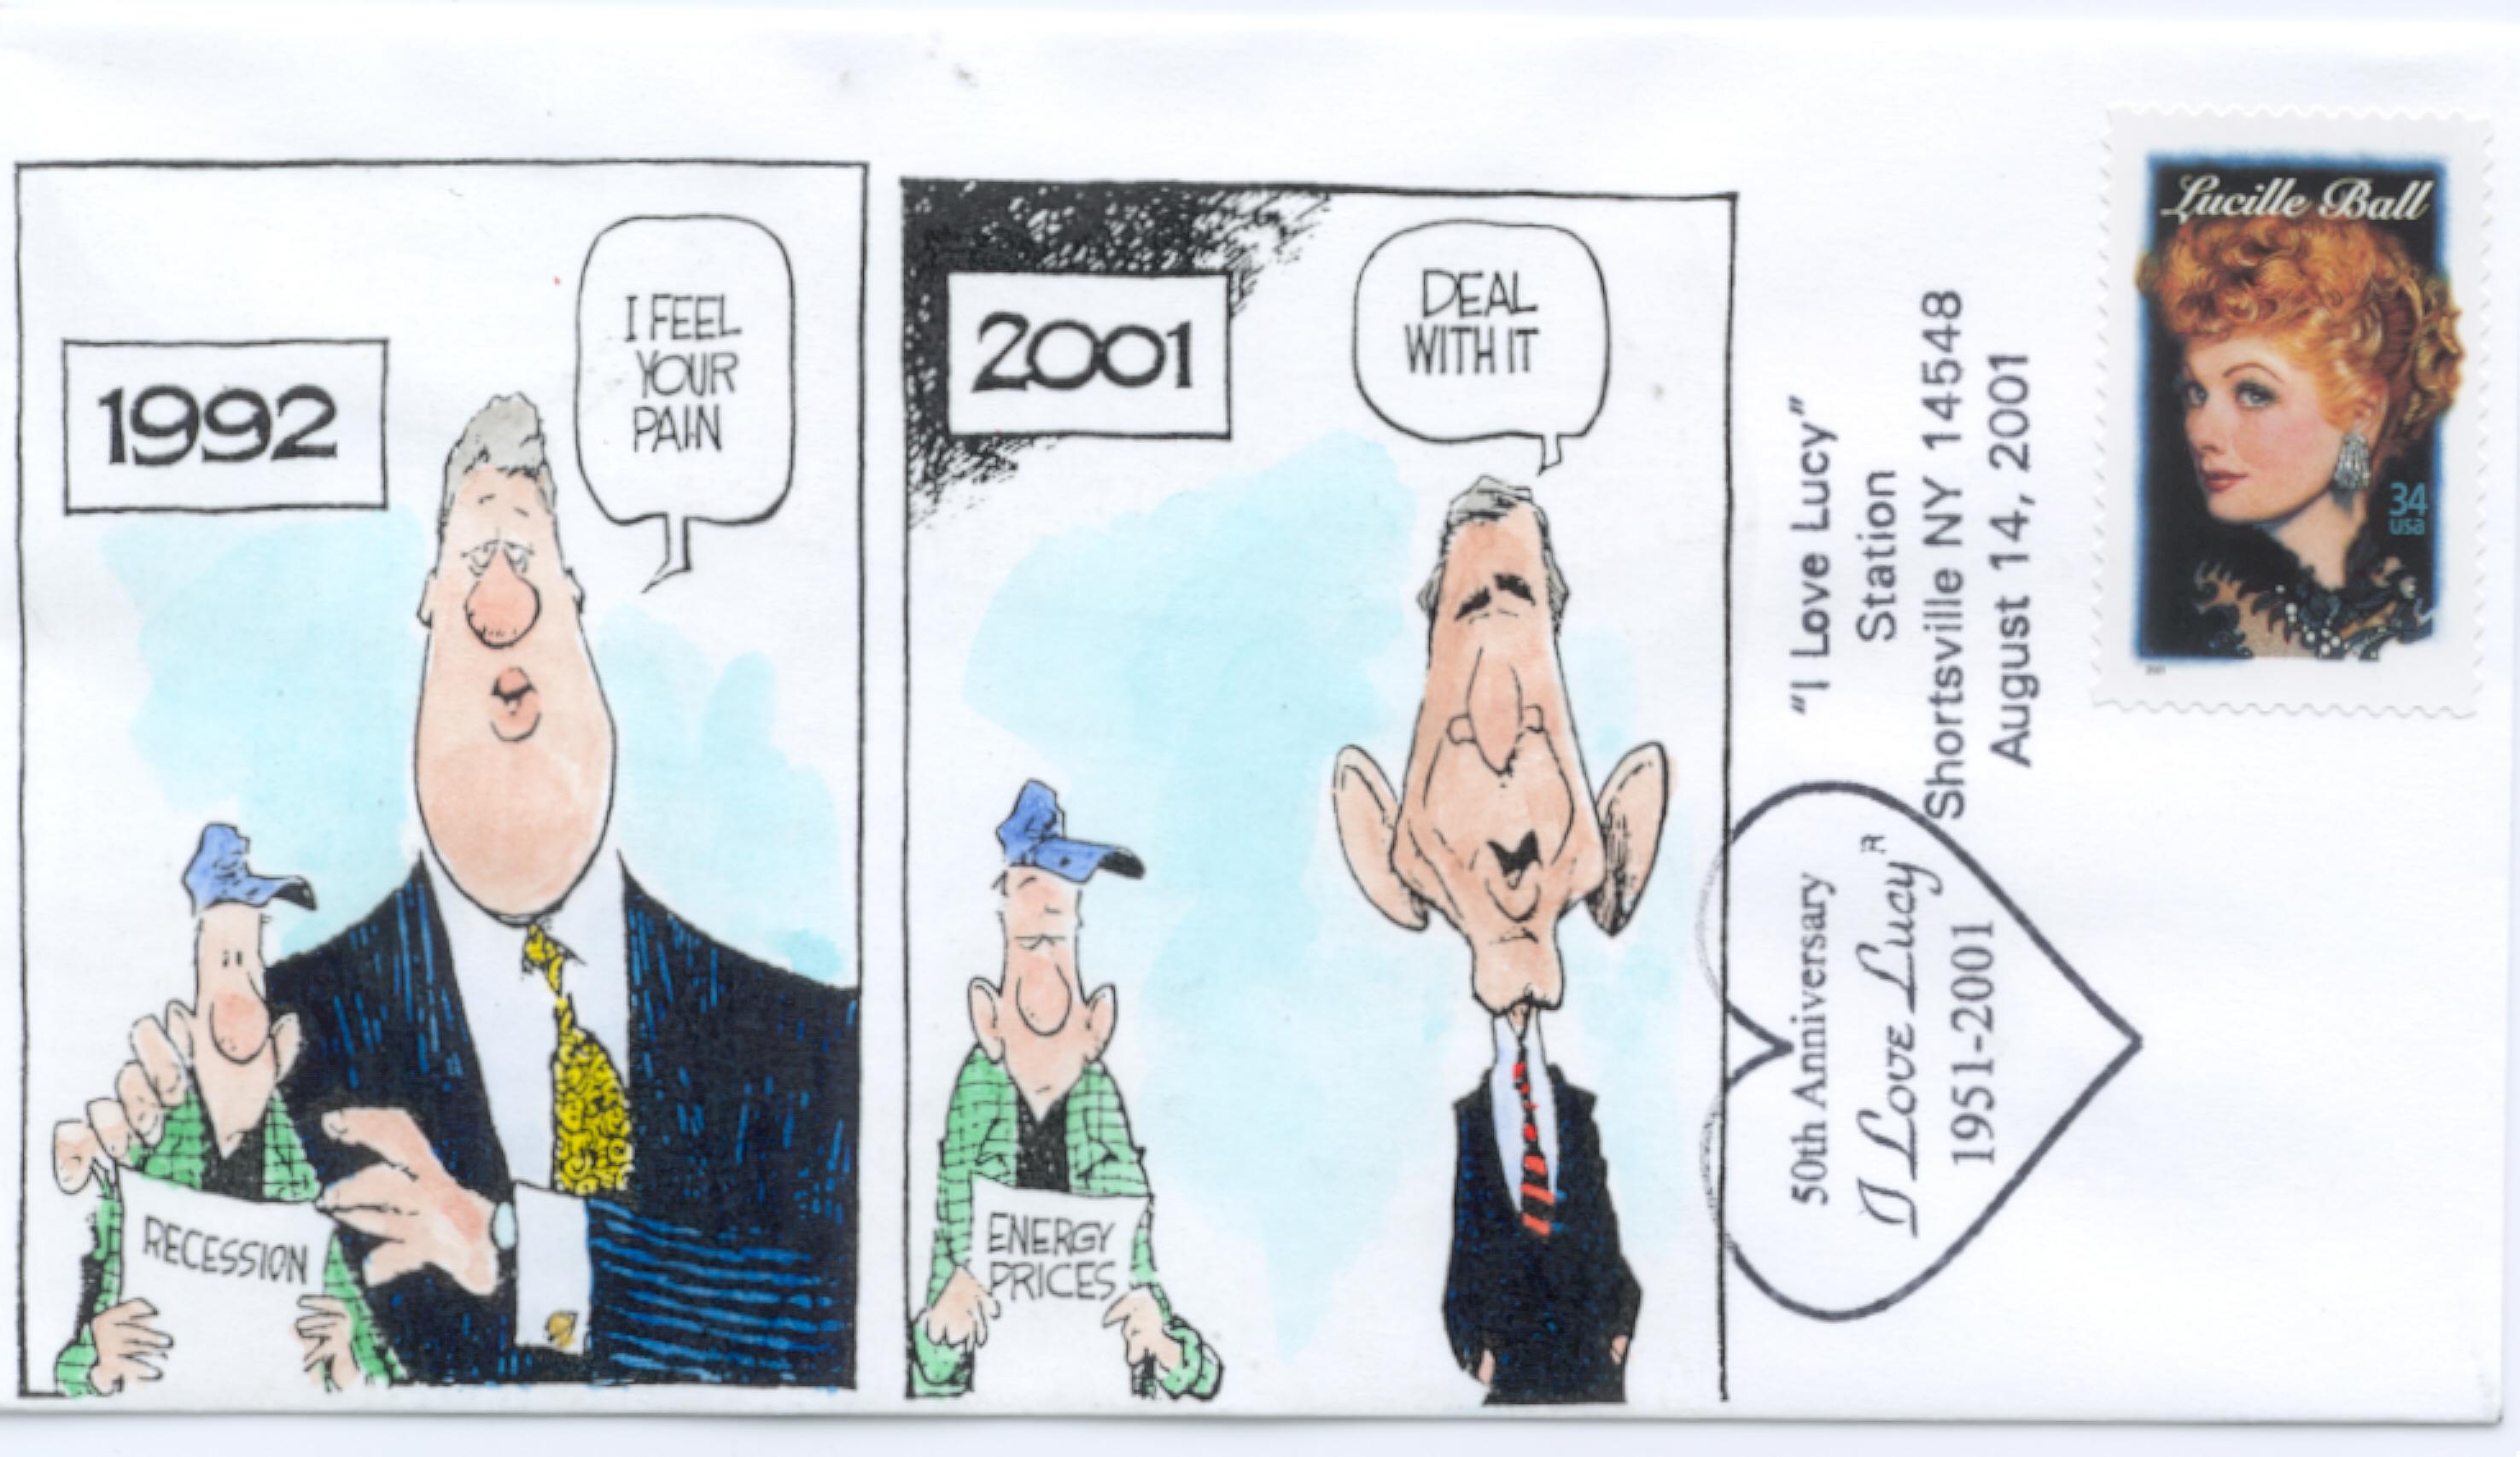 1992/2001 cartoon